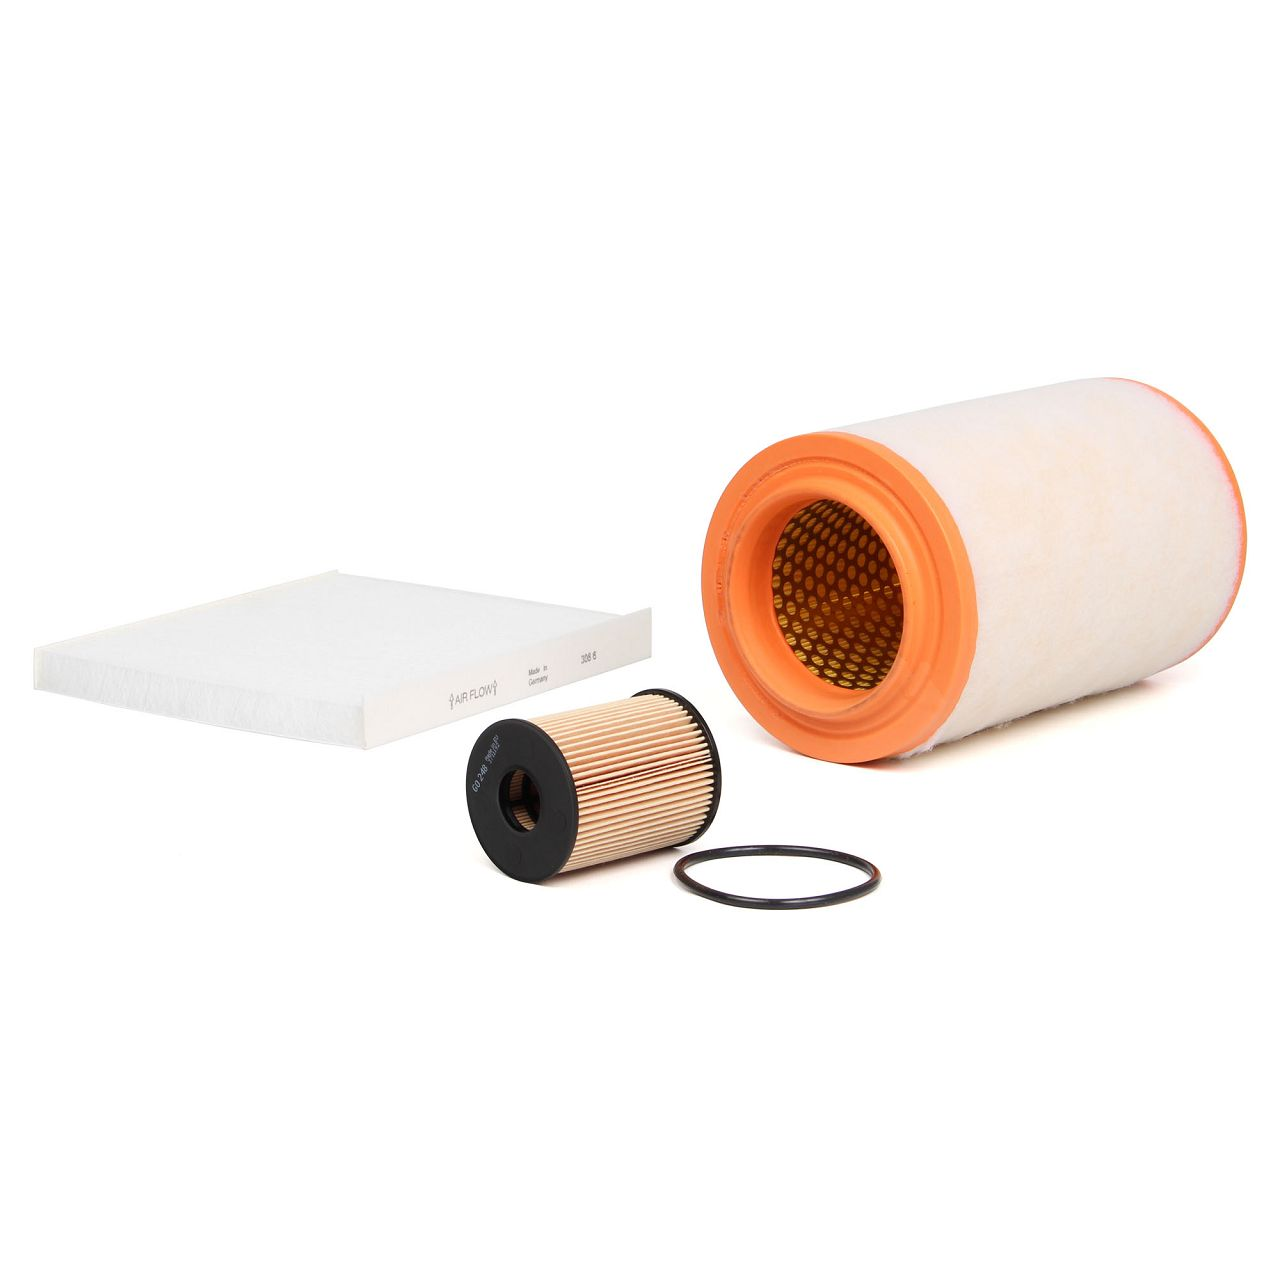 Inspektionskit Filterpaket ALFA ROMEO Giulietta (940_) 1.4 TB 105-170 PS